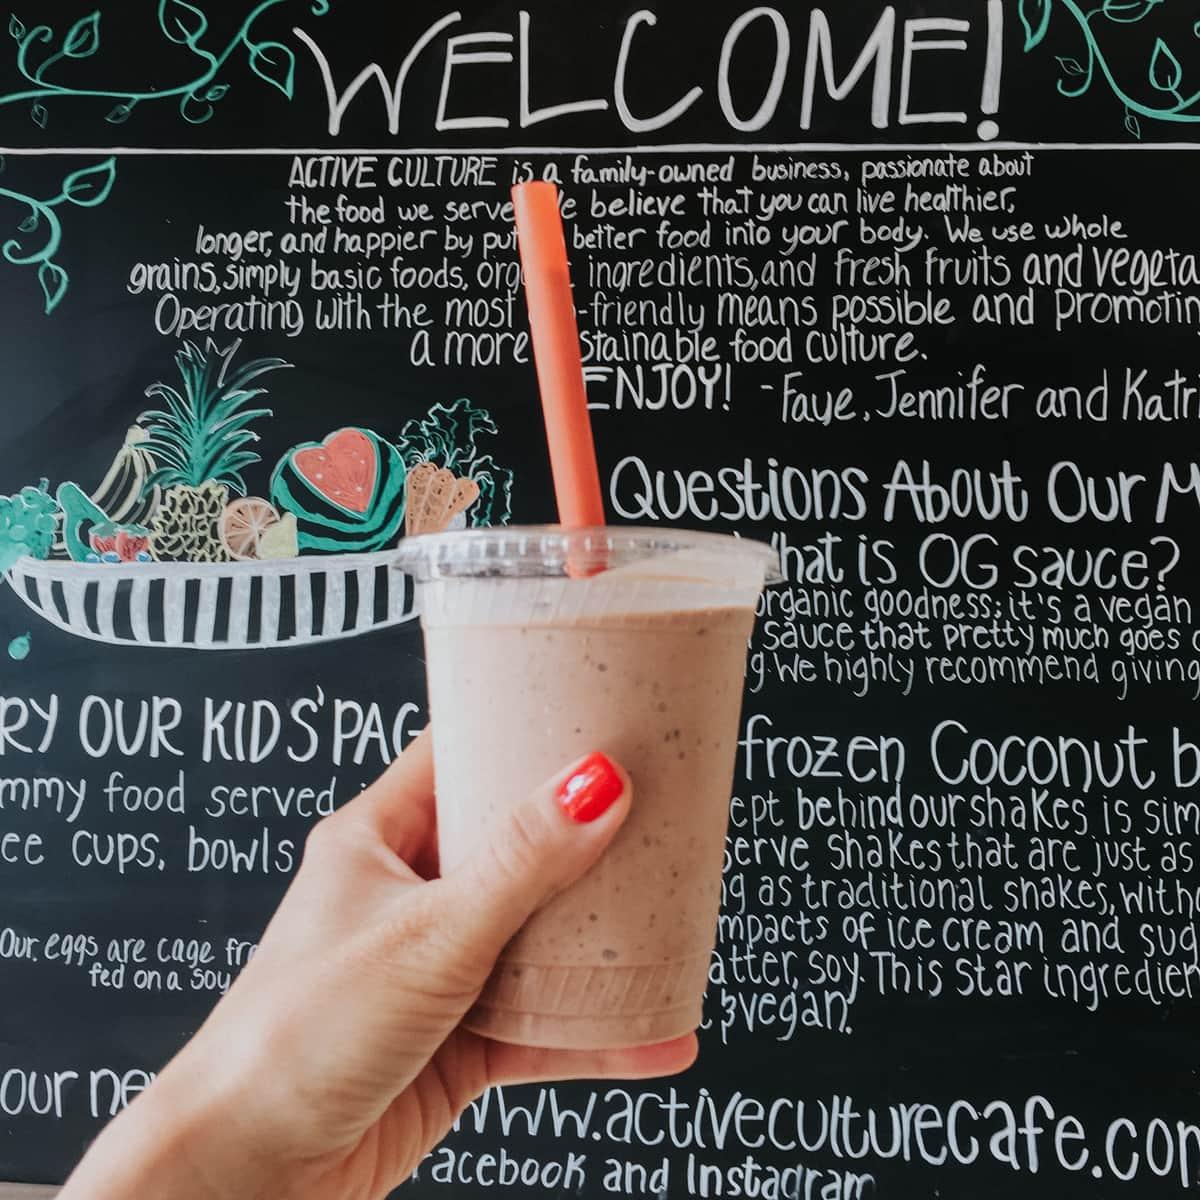 yummy vegan food in Orange County - active culture